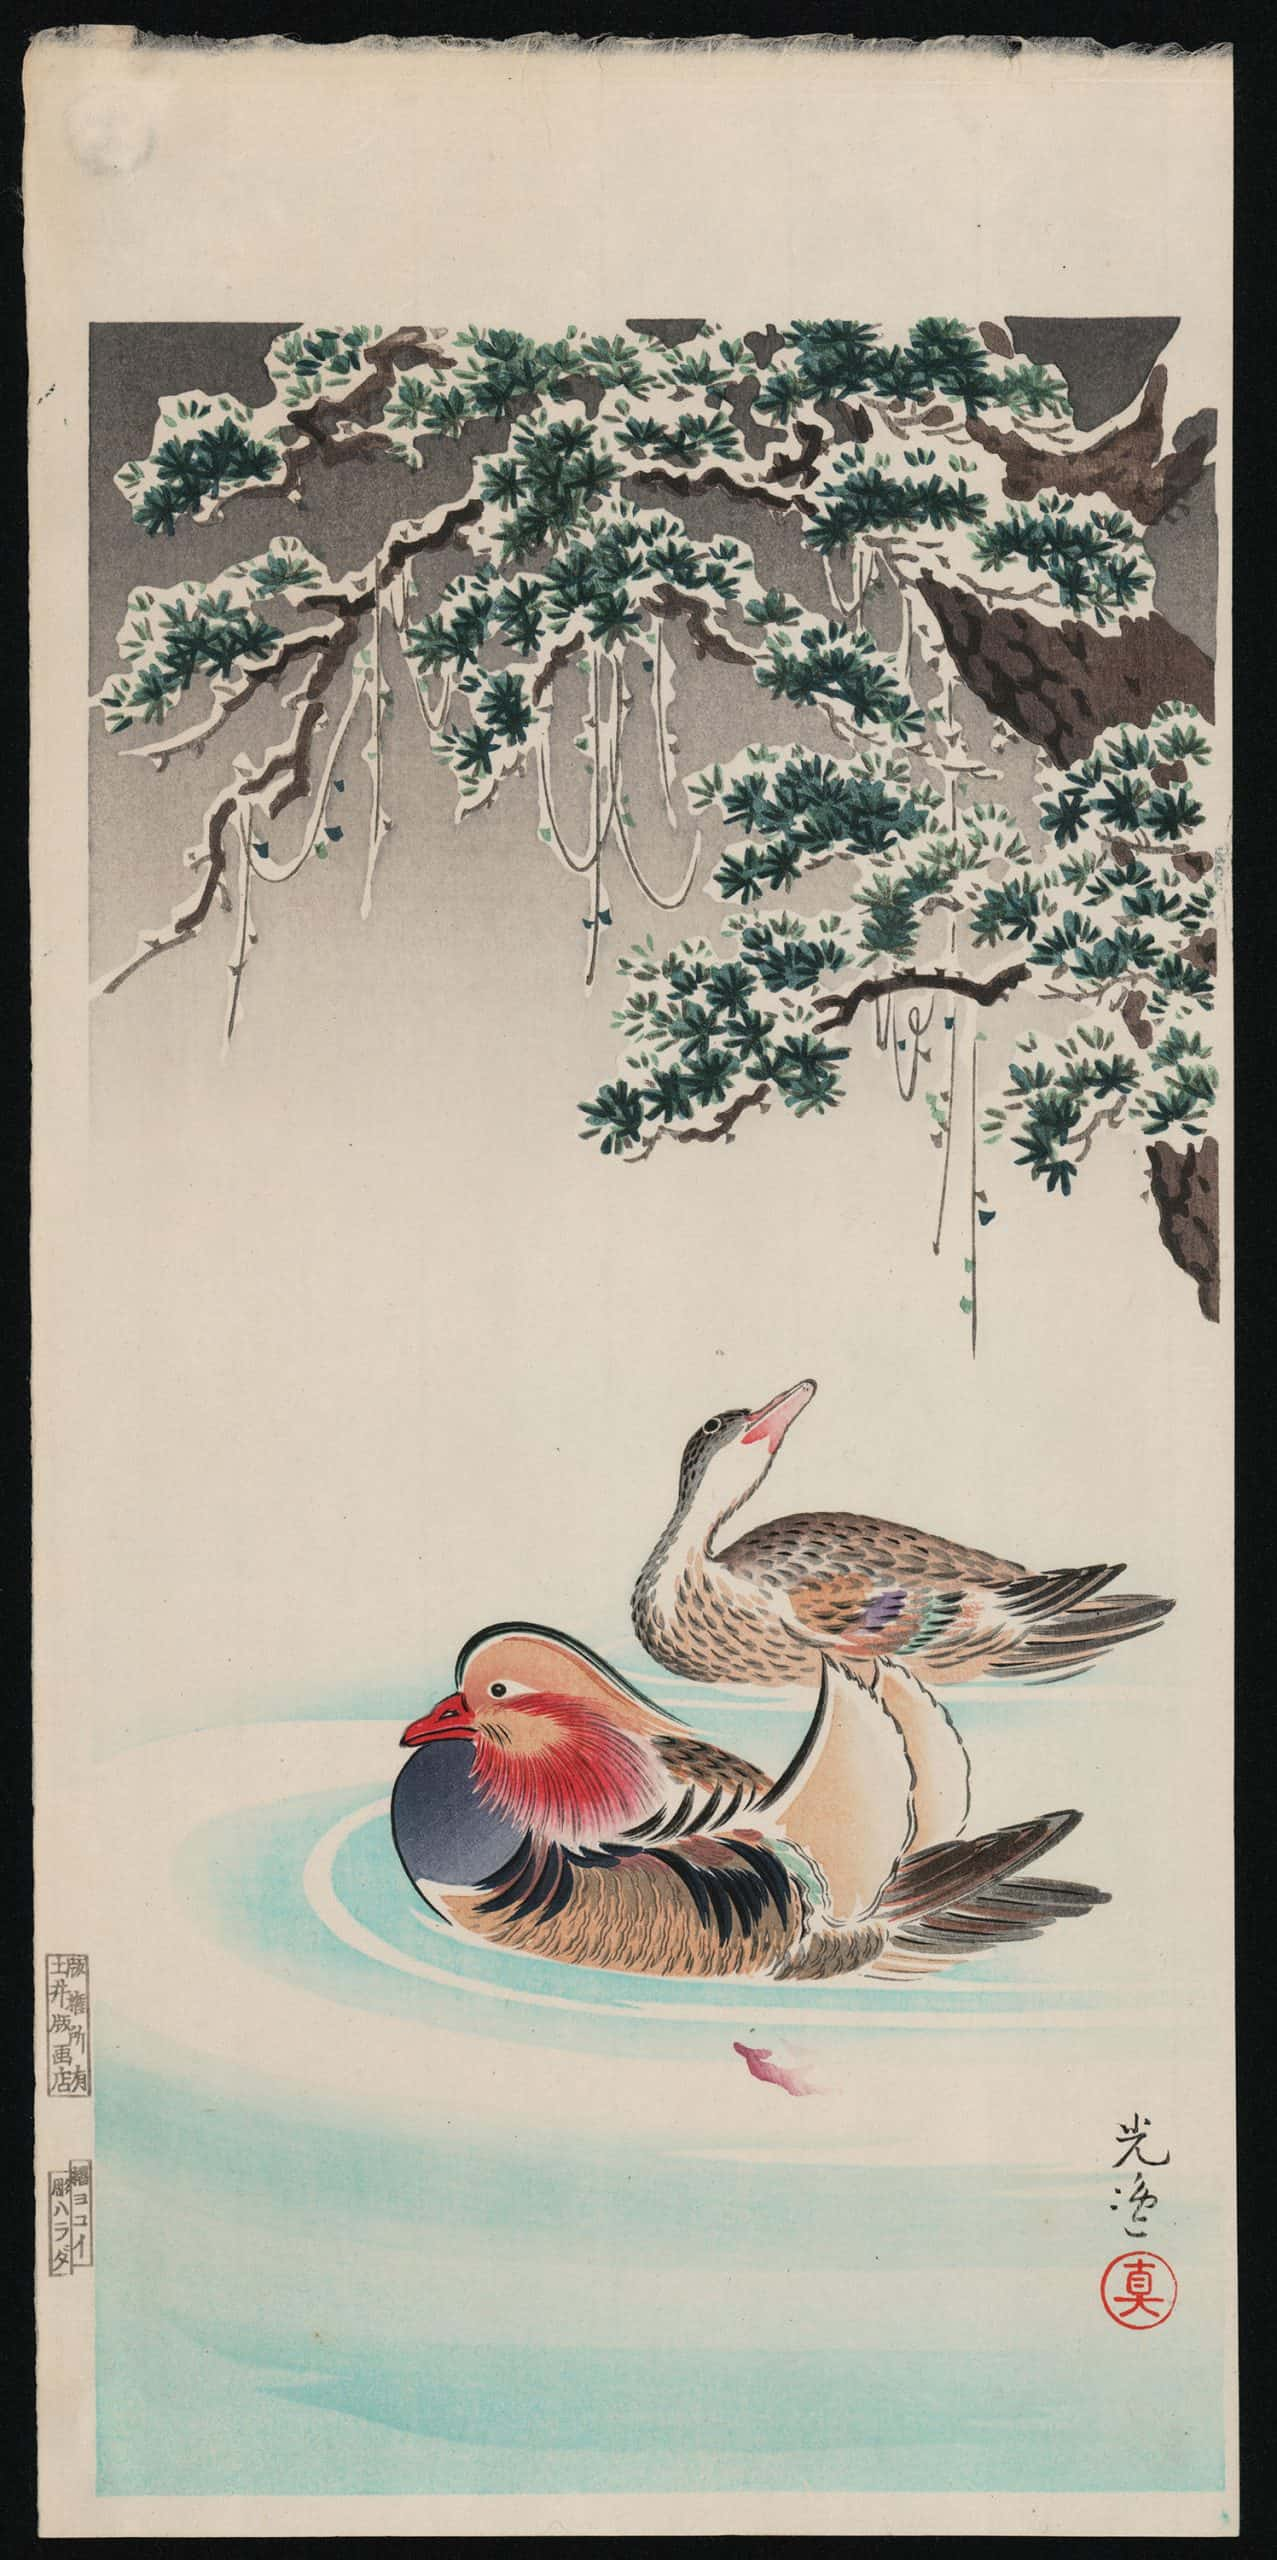 Tsuchiya Koitsu - Mandarin Ducks